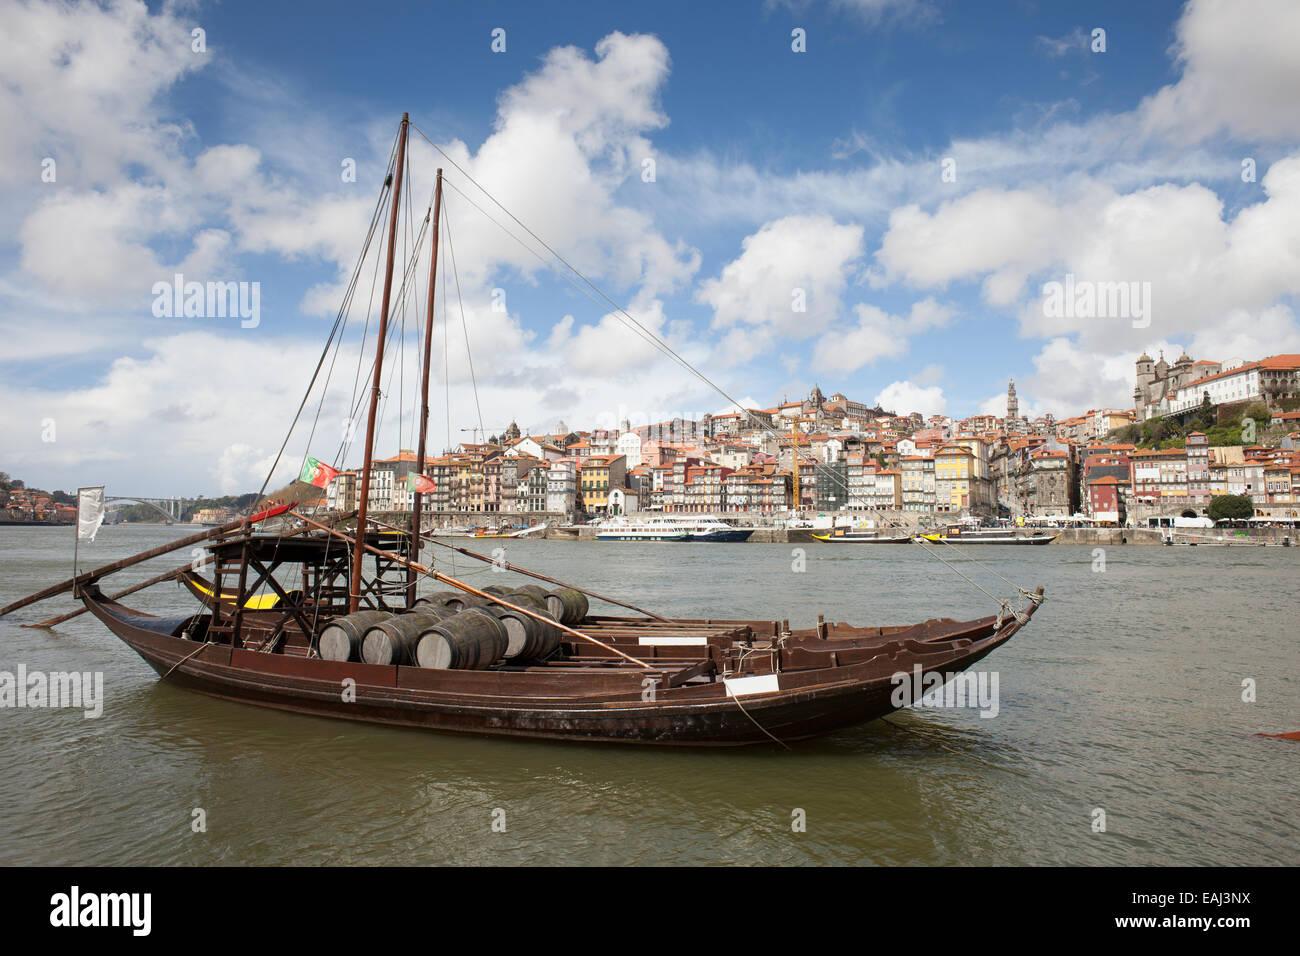 City of Porto in Portugal. Rabelo traditional Portuguese cargo boat with Port wine barrels on Douro river. Stock Photo